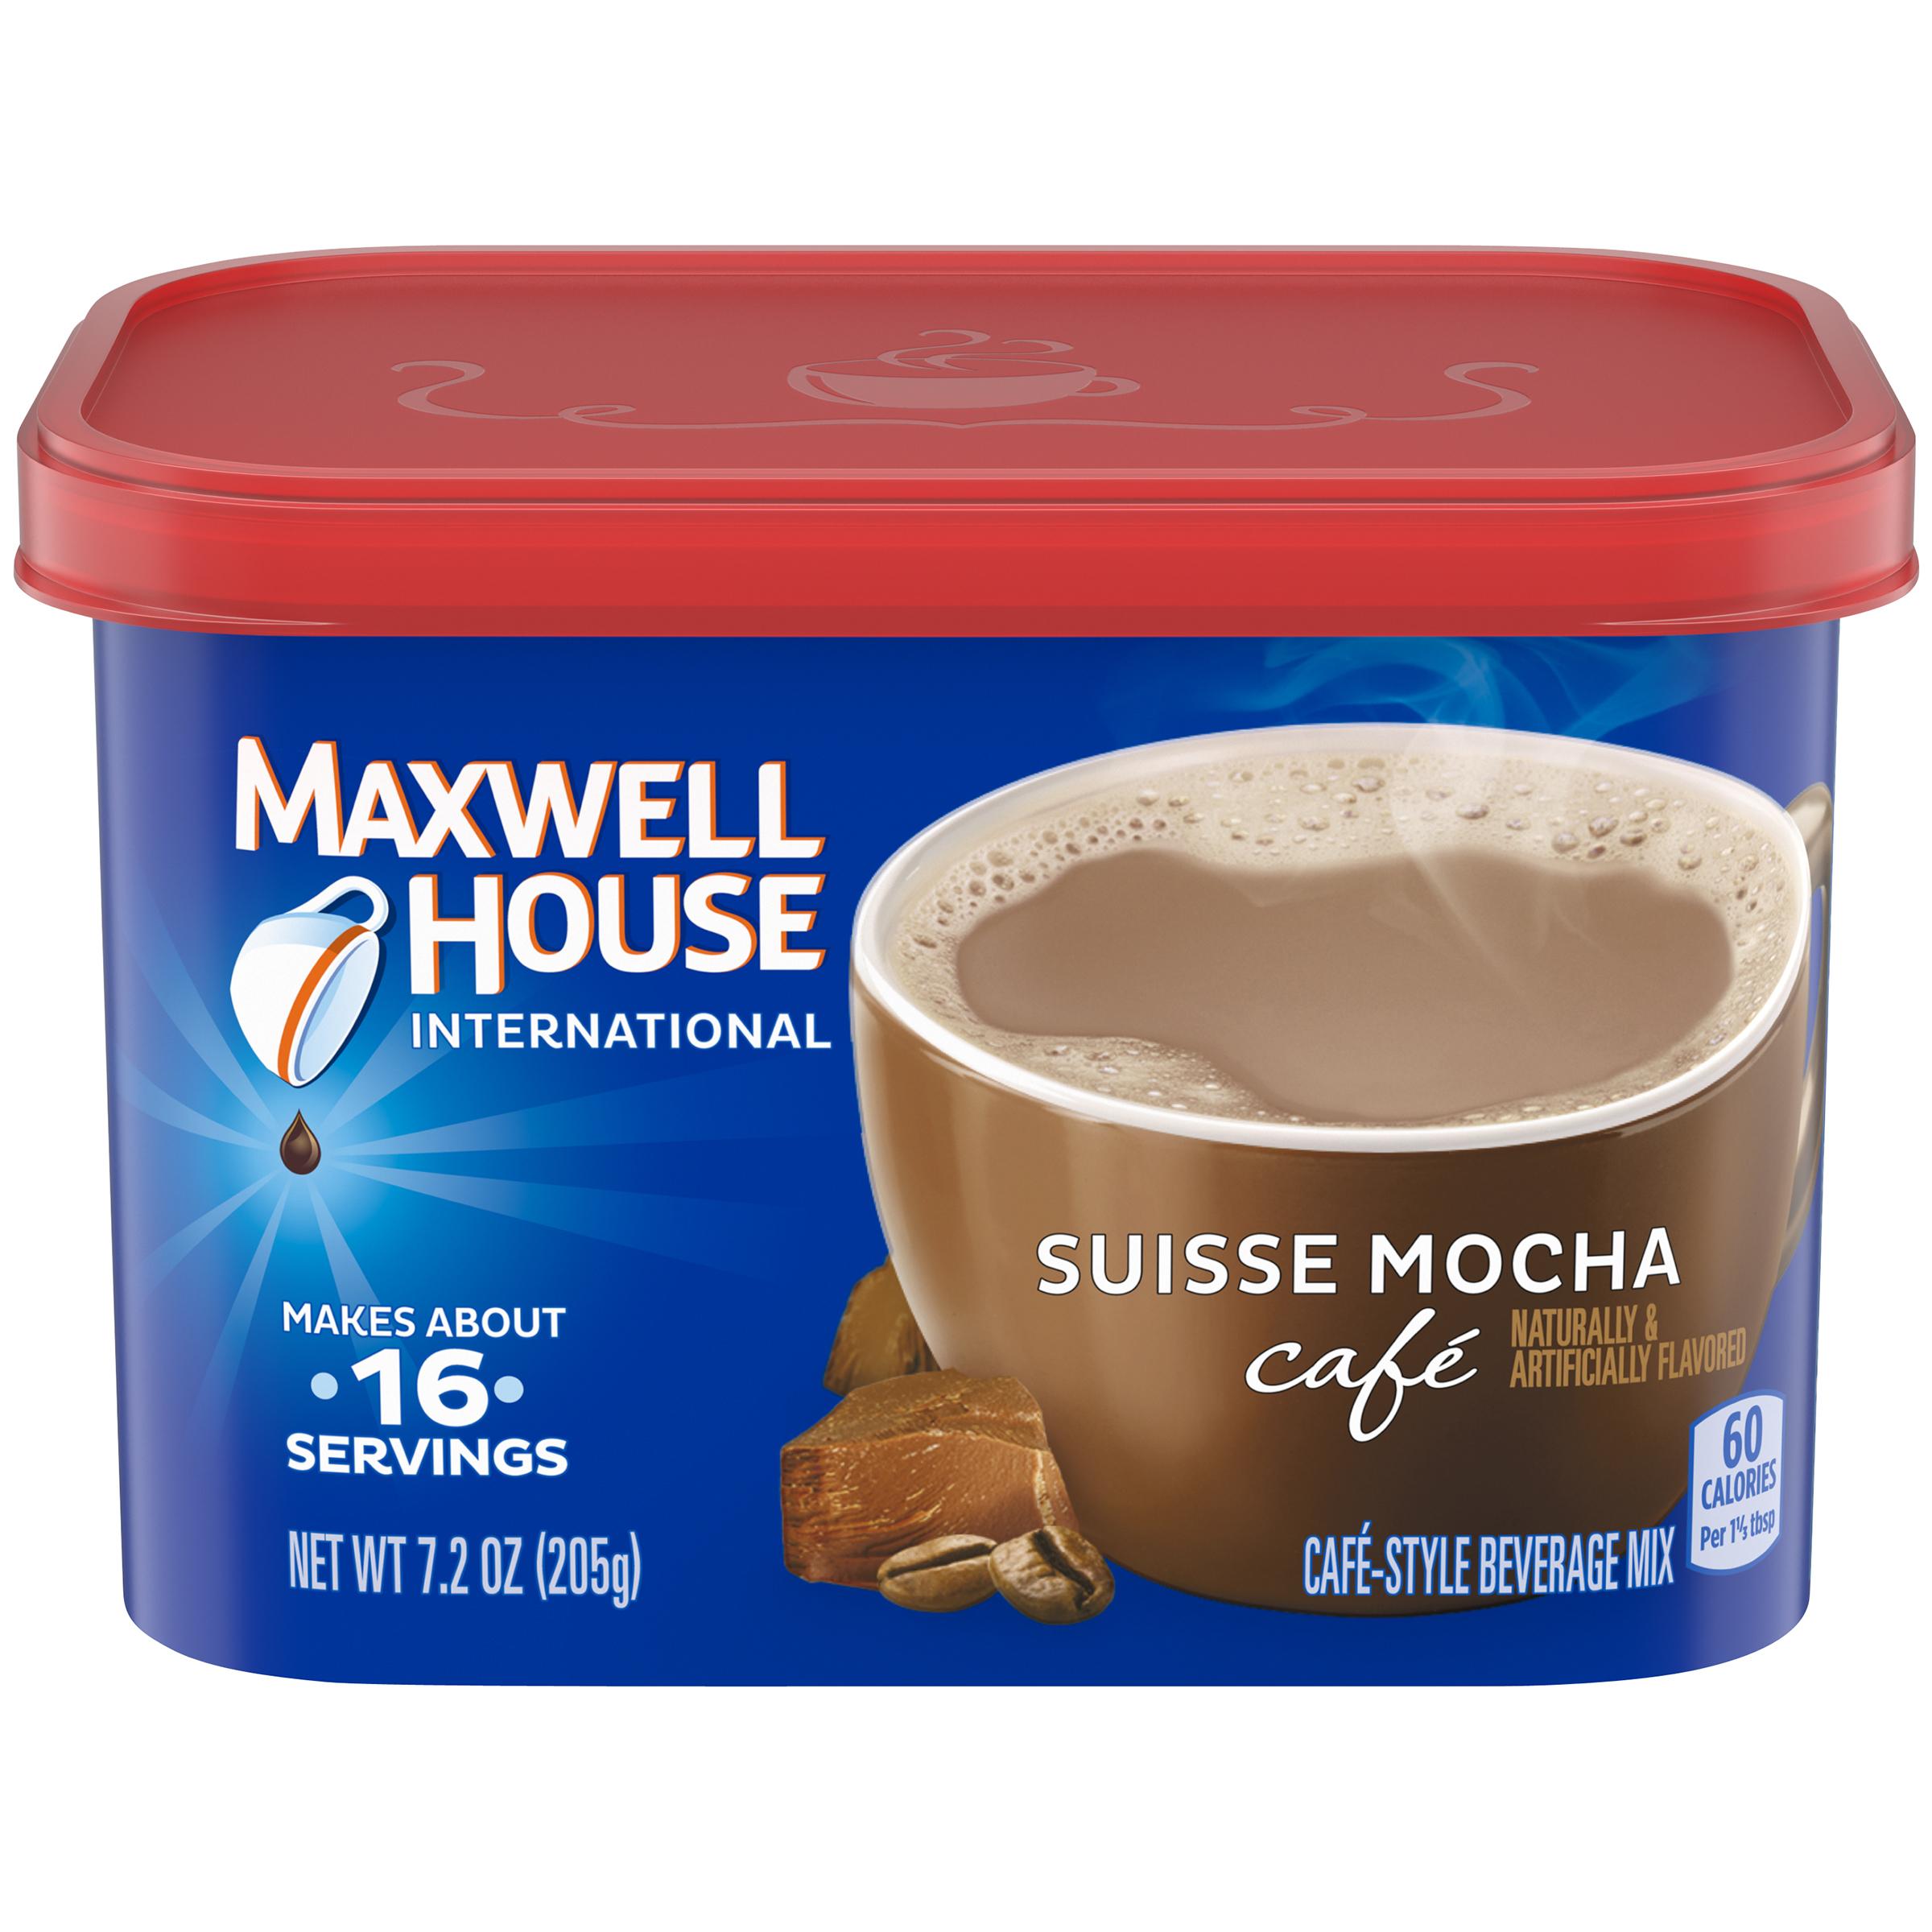 Maxwell House International Suisse Mocha Coffee 7.2 Oz